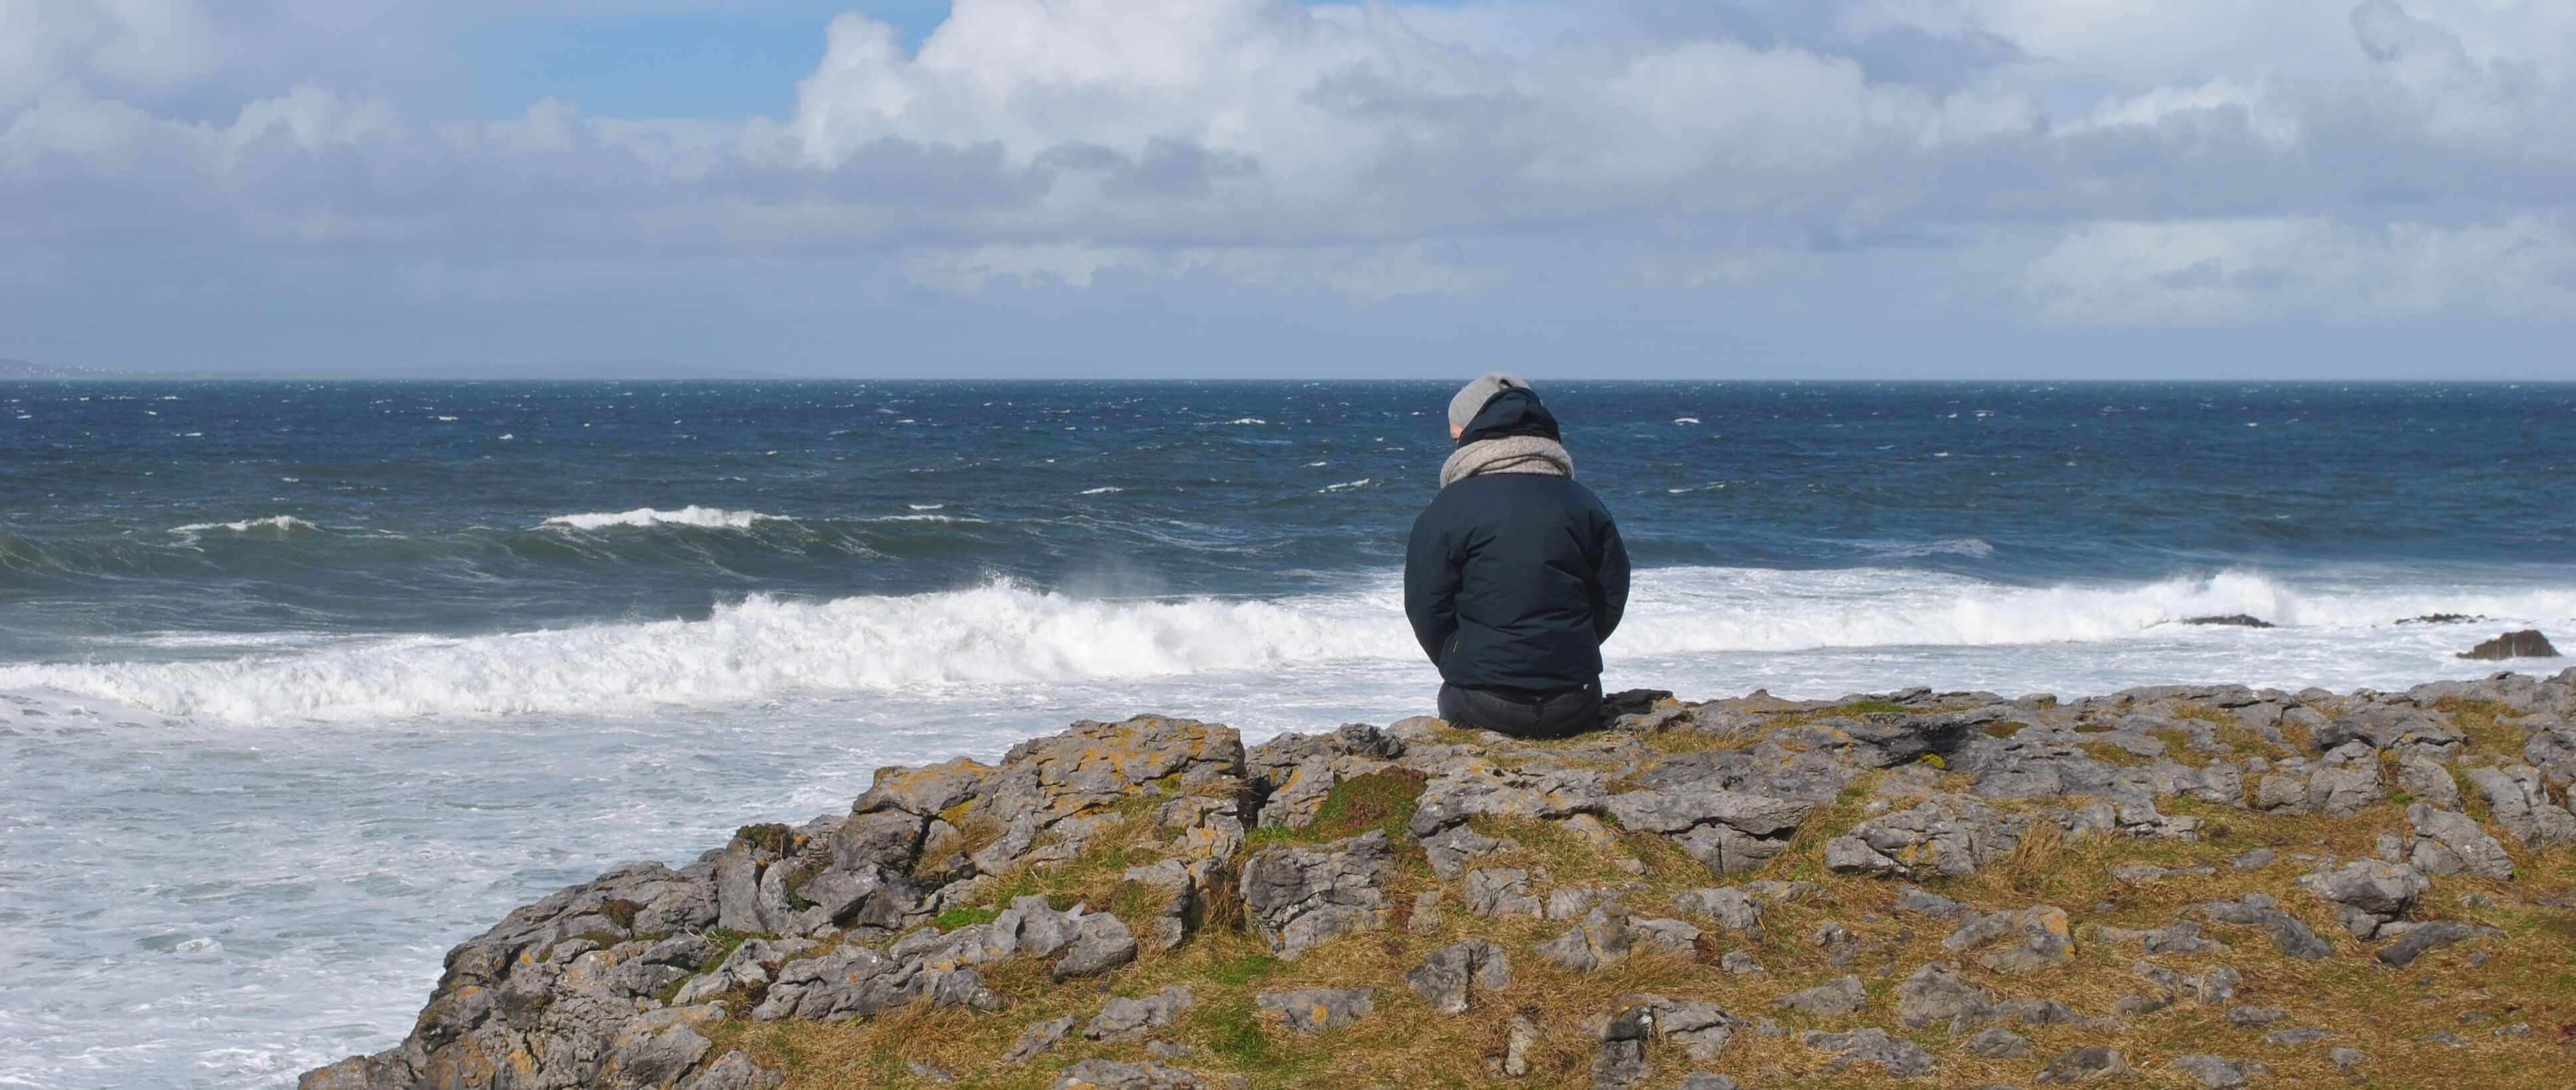 Auslandserfahrung Irland